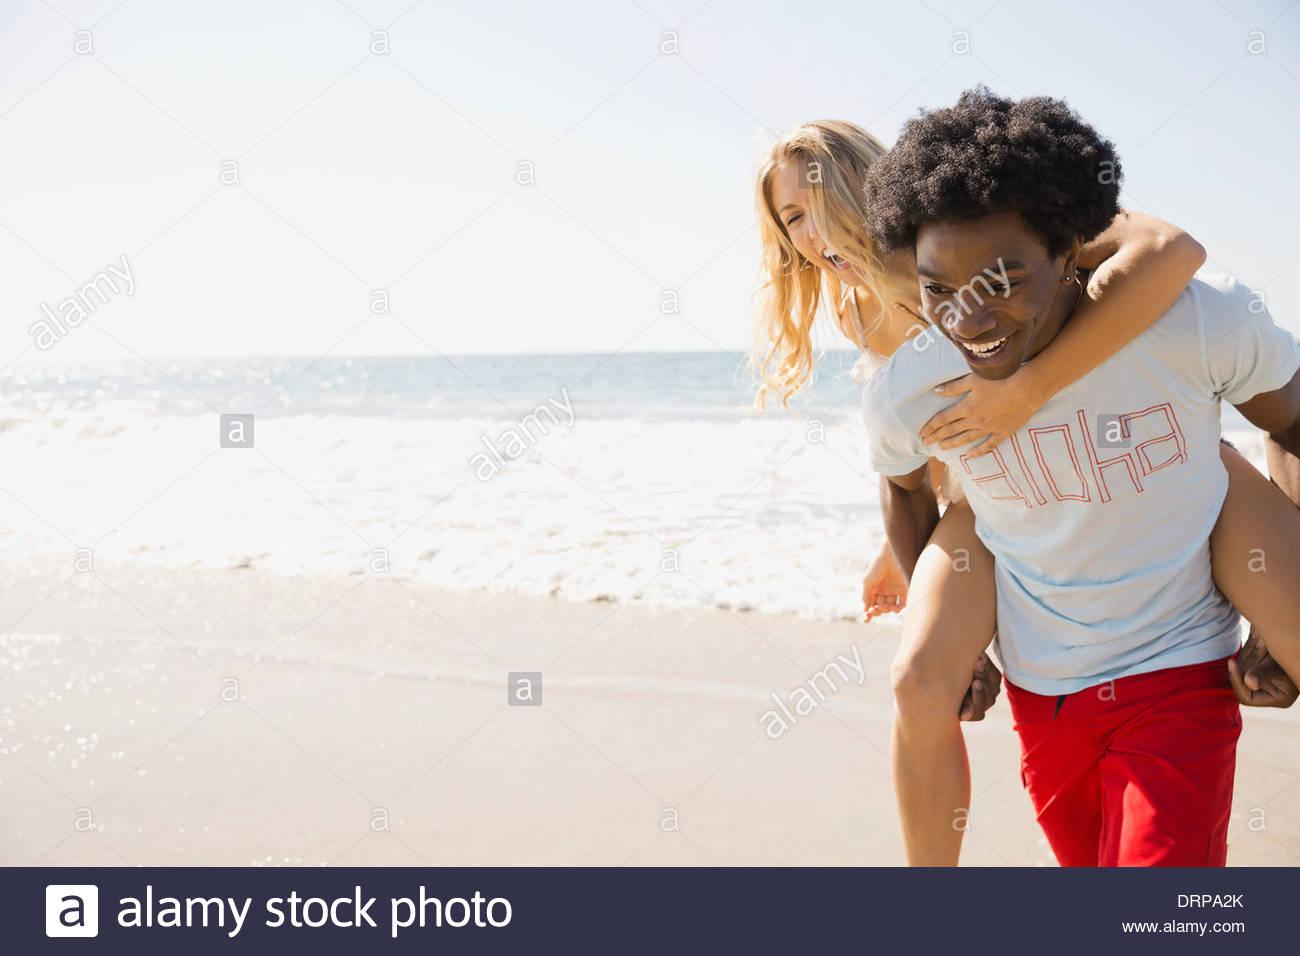 Pareja juguetona en la playa Imagen De Stock